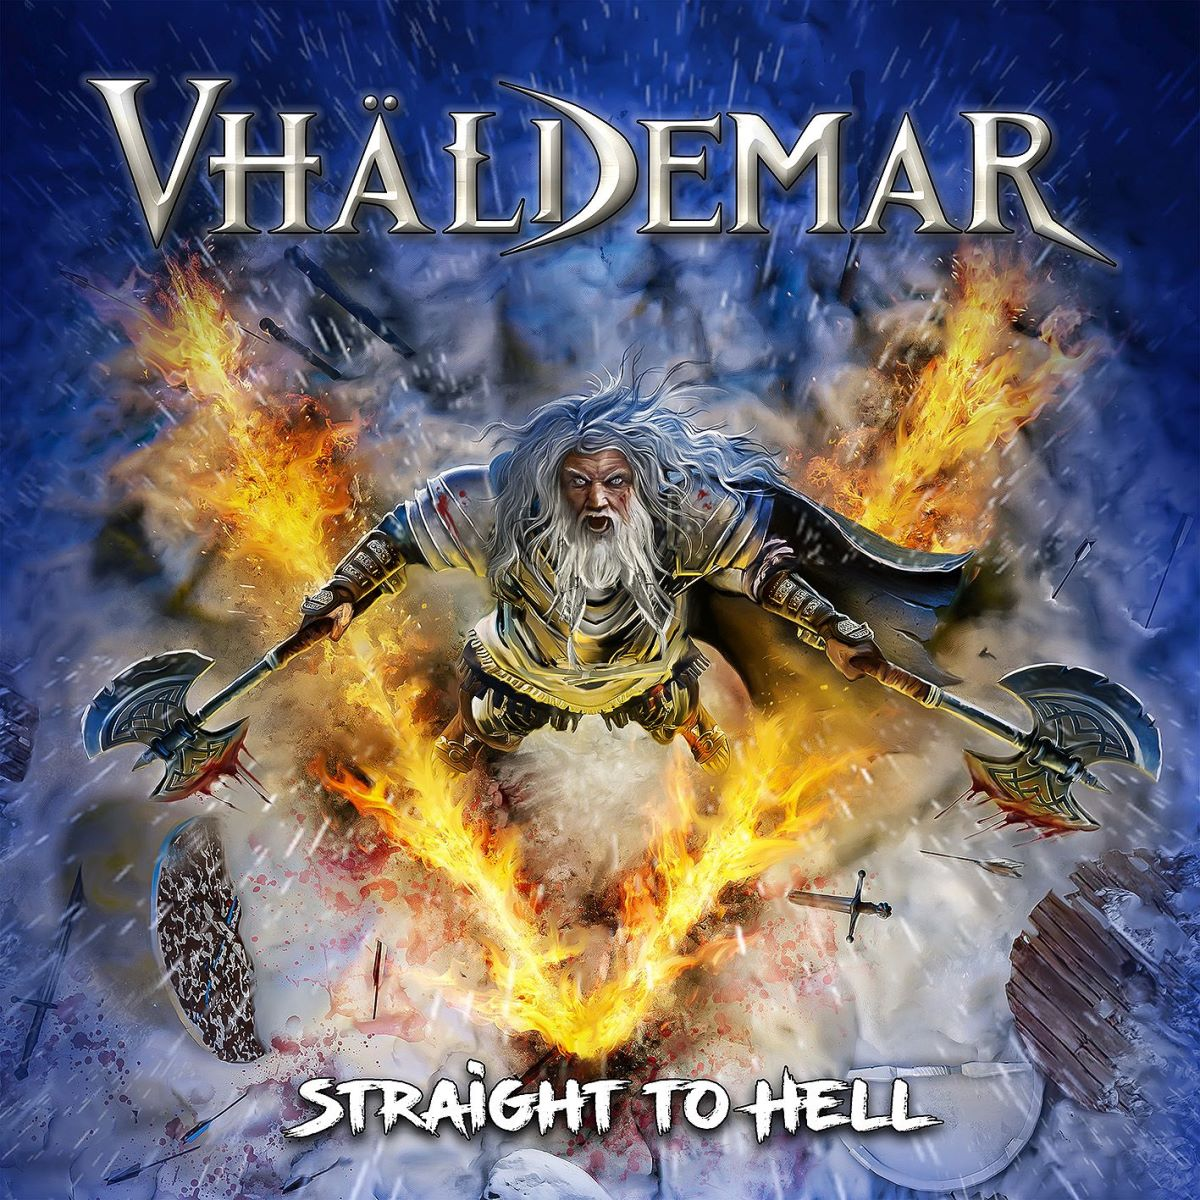 Vhaldemar - Straight to Hell - album cover